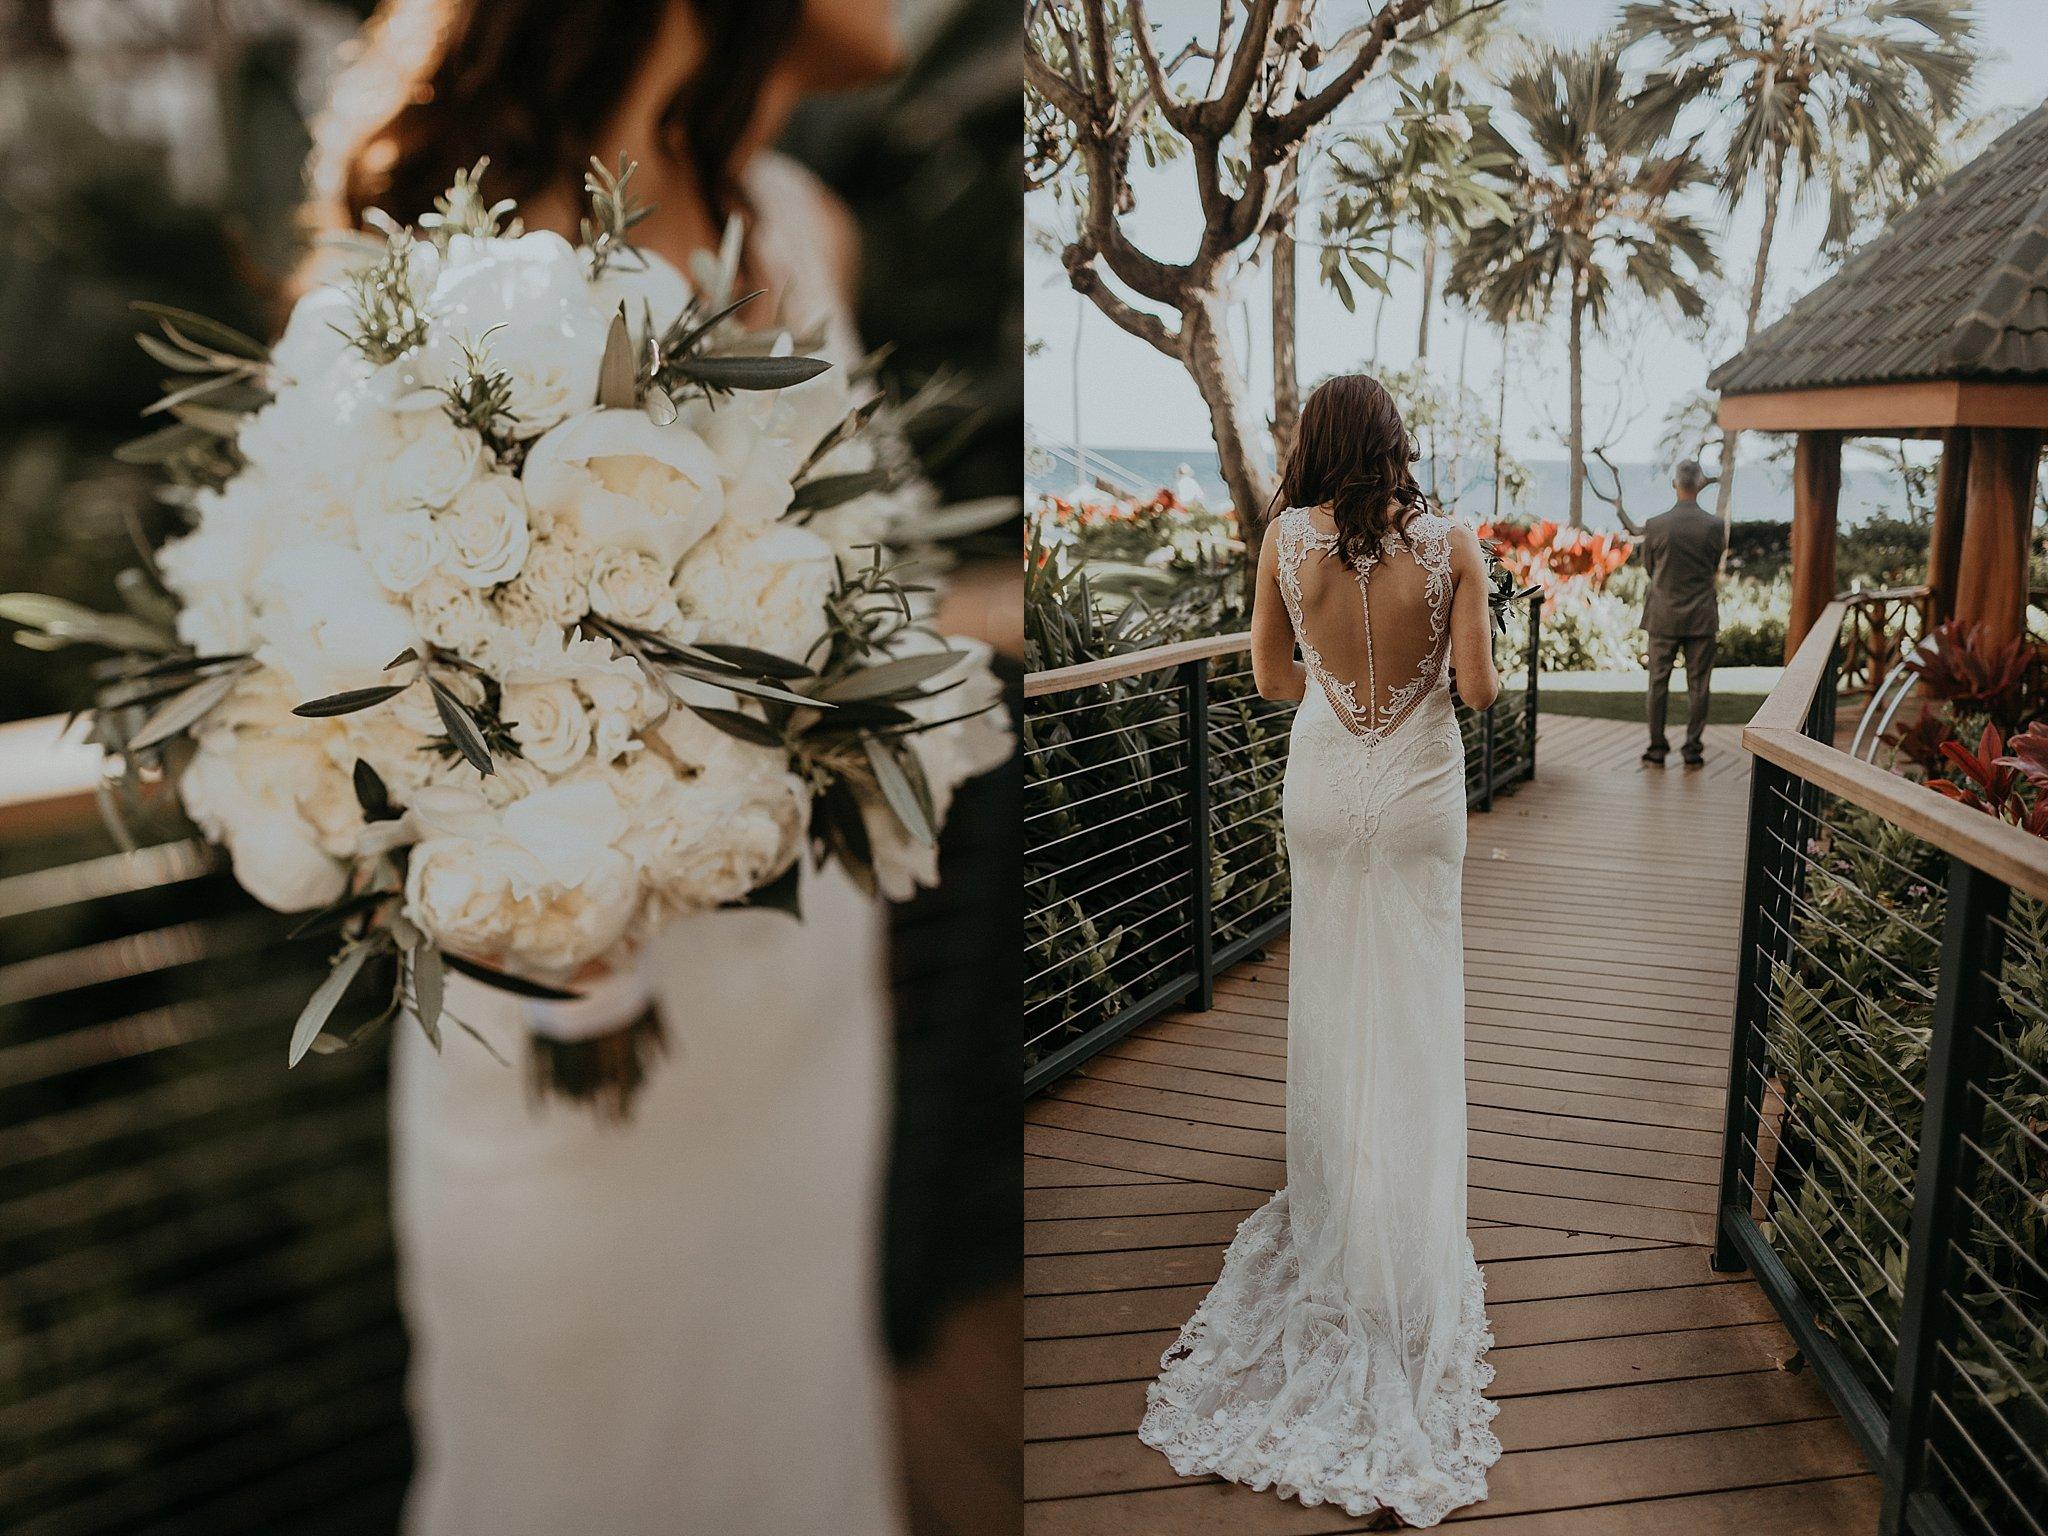 samantha_mcfarlen_bellingham_washington_engagement_photography_seattle_wedding_photographer_0193.jpg